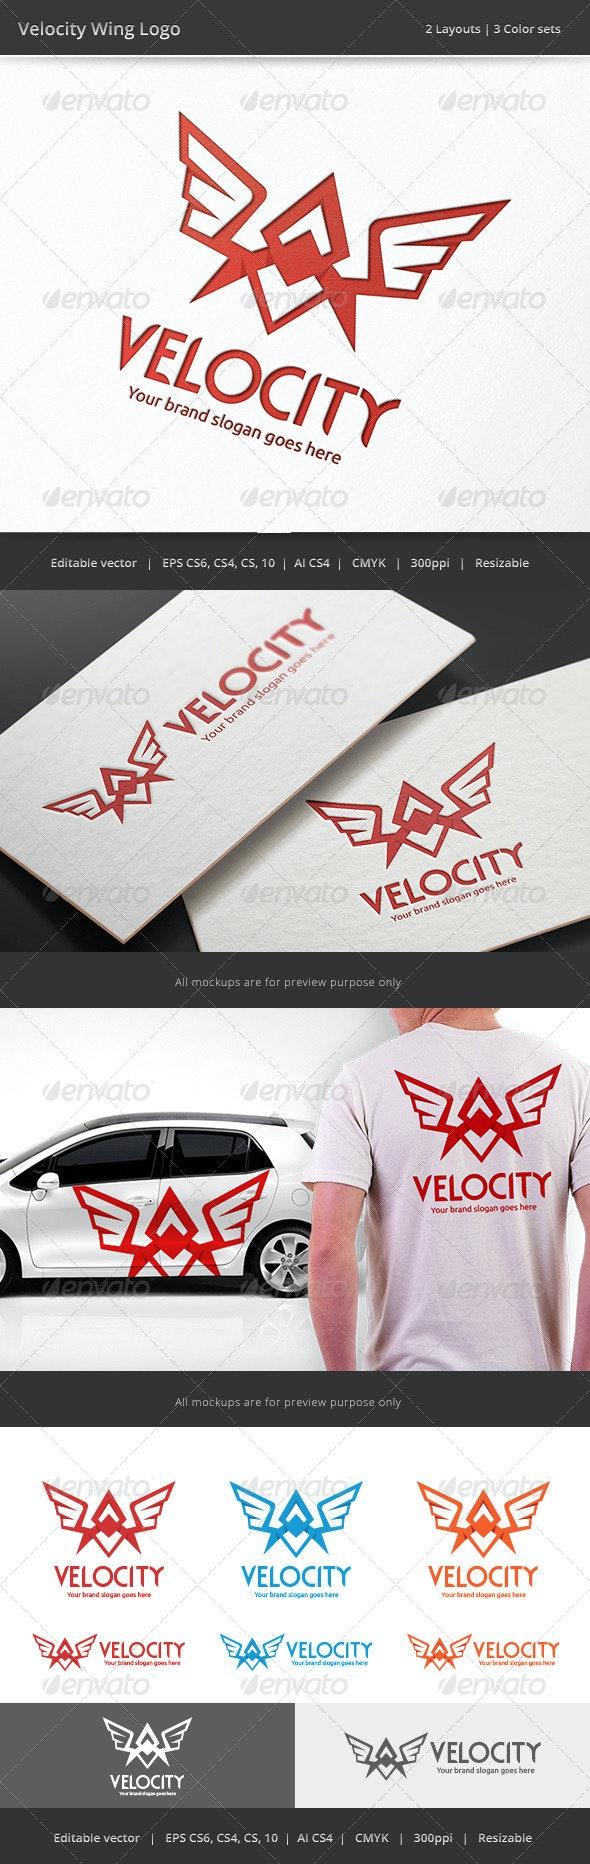 Velocity Wing Logo - Vector Abstract